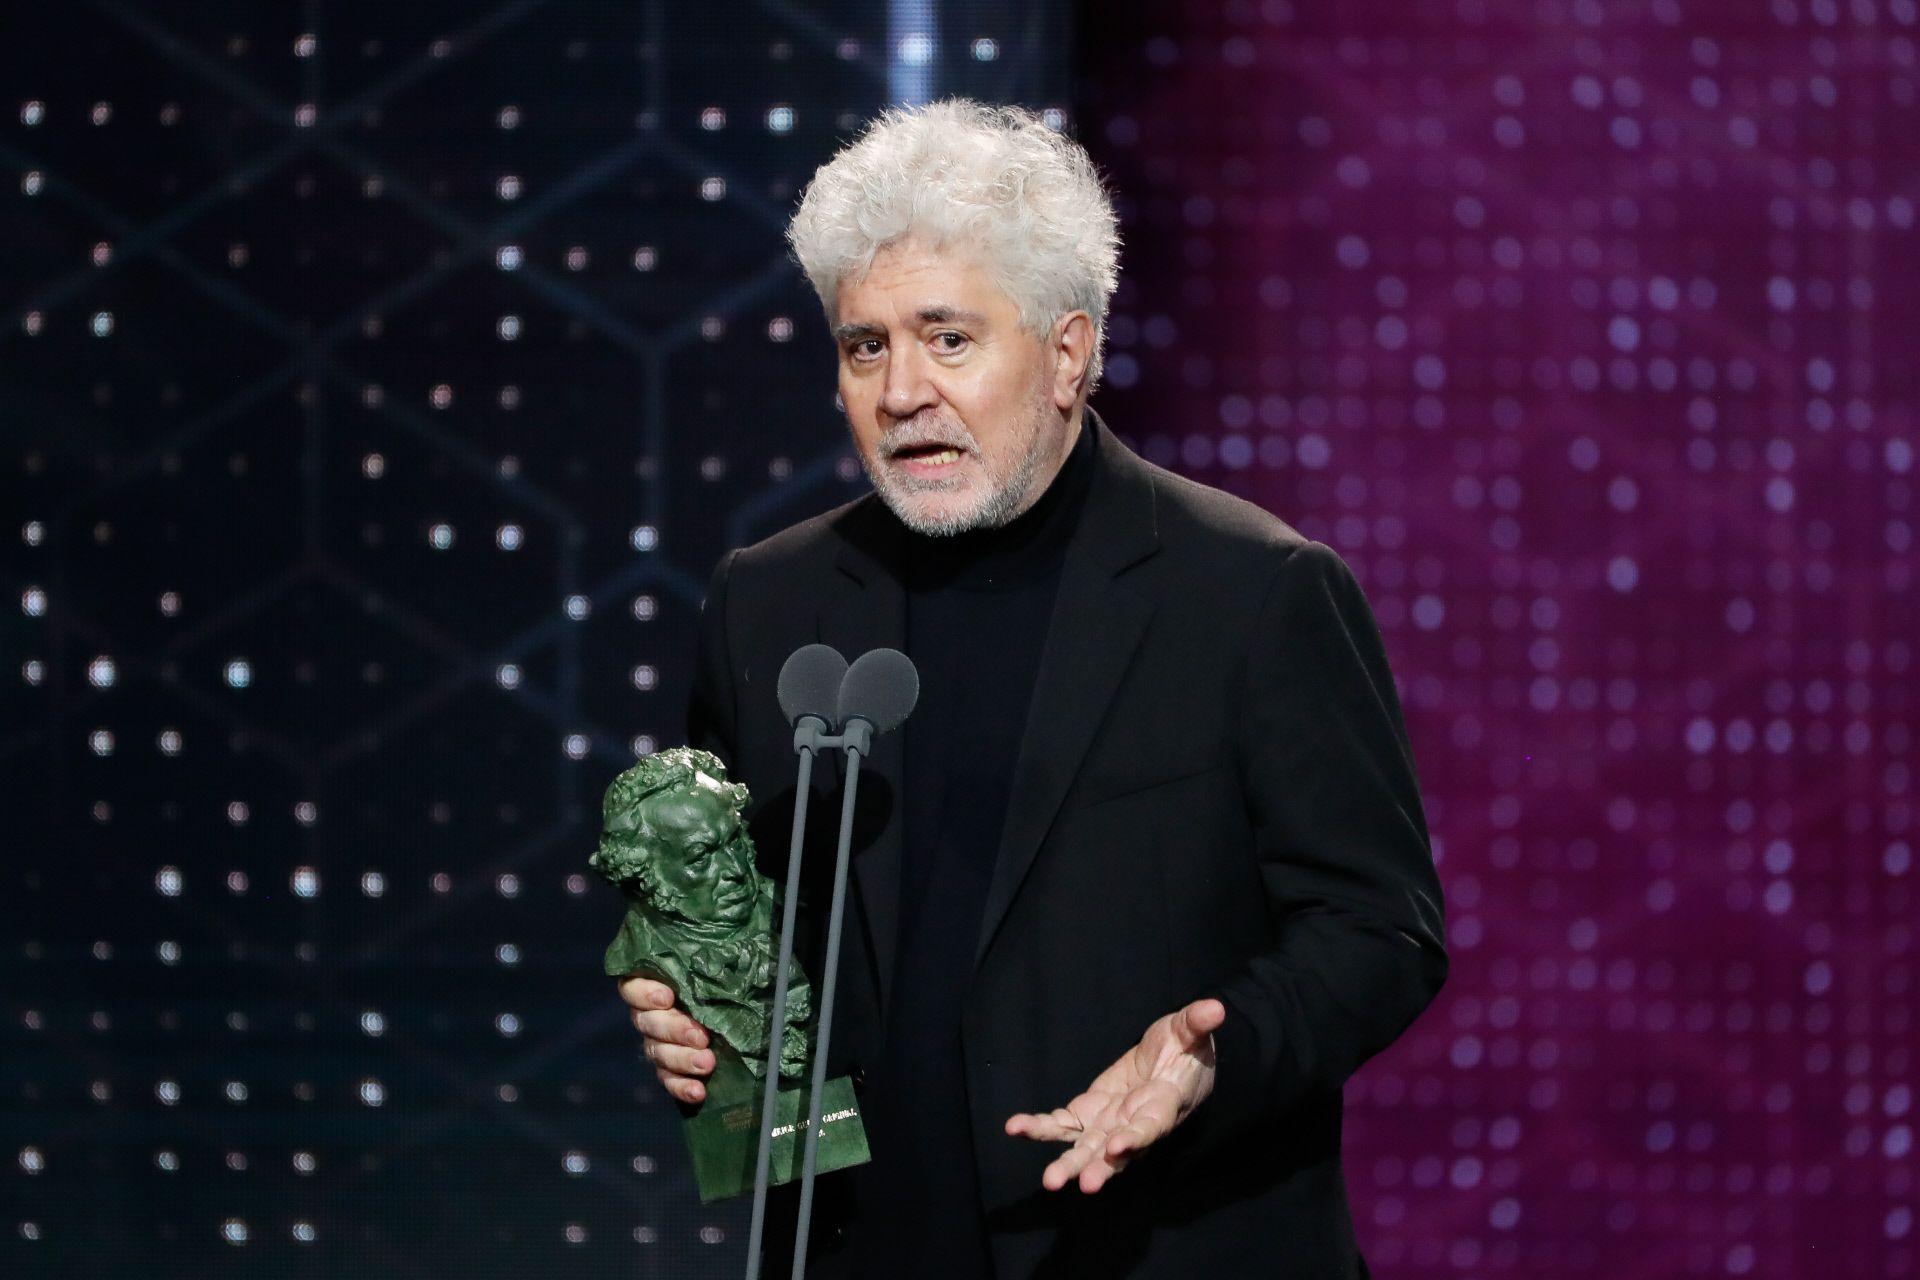 Premios Goya 2020 Palmarés Completo - Lista Ganadores Goya 2020